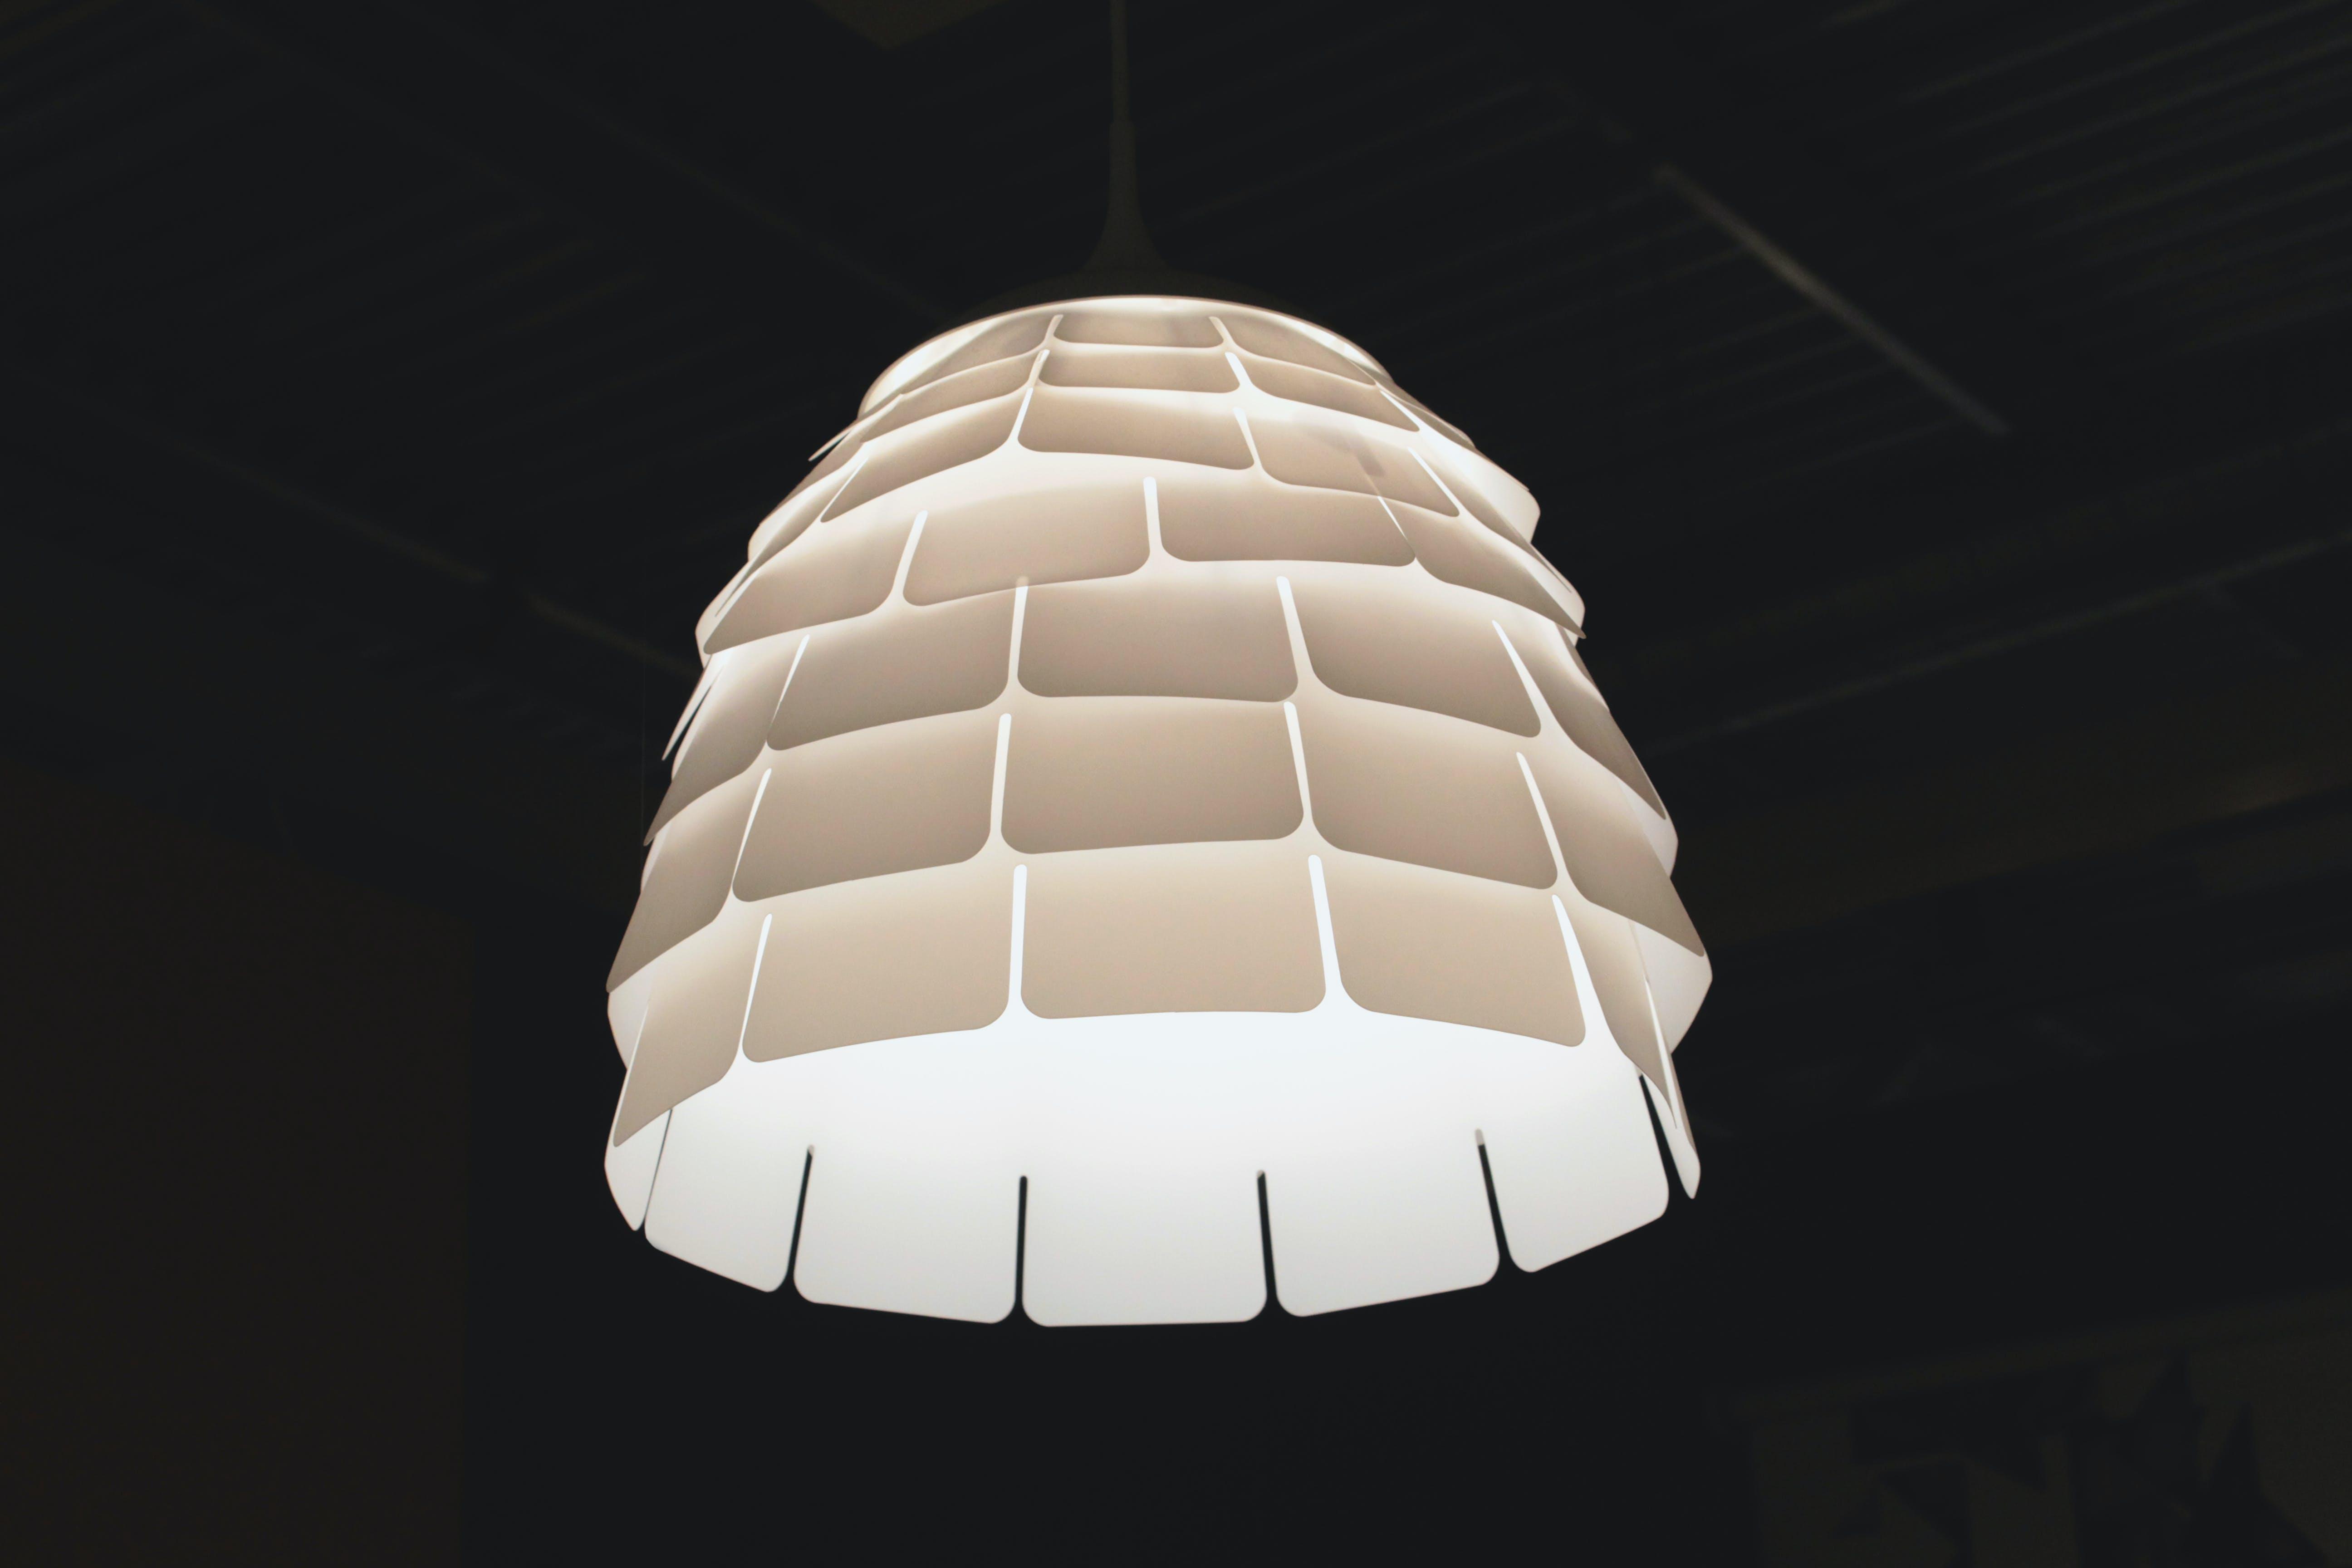 Turned on White Pendant Lamp